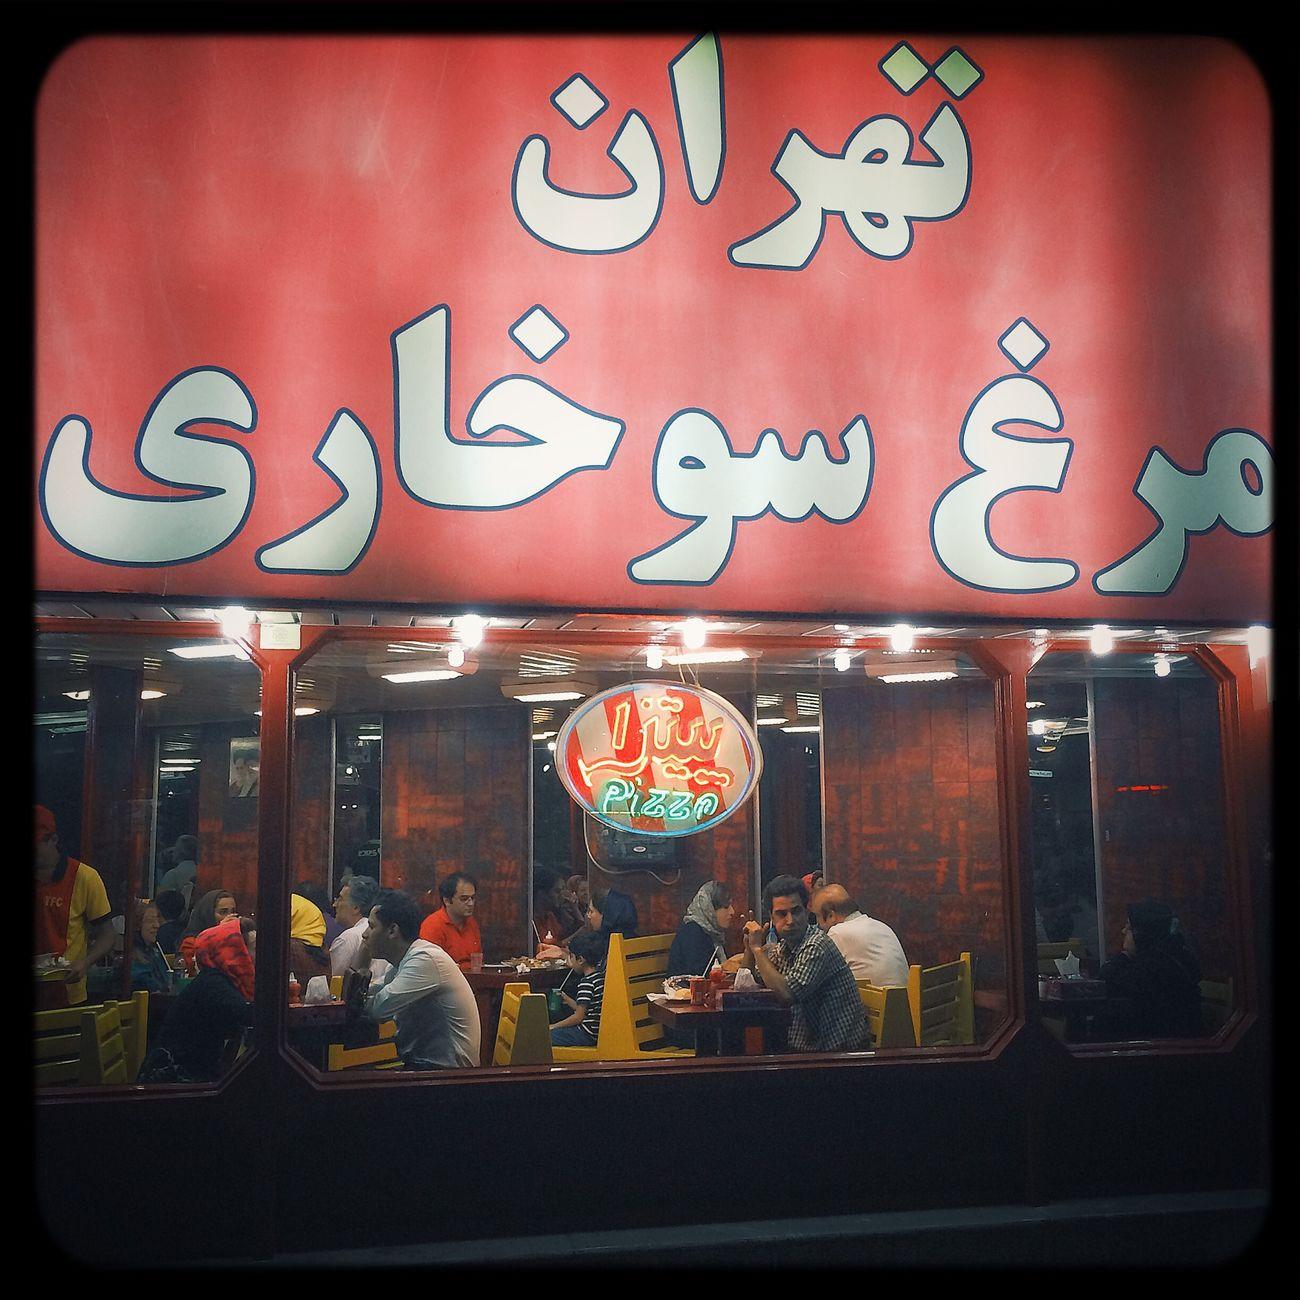 Nostalgia Fast Food Persian Kfc Tehran